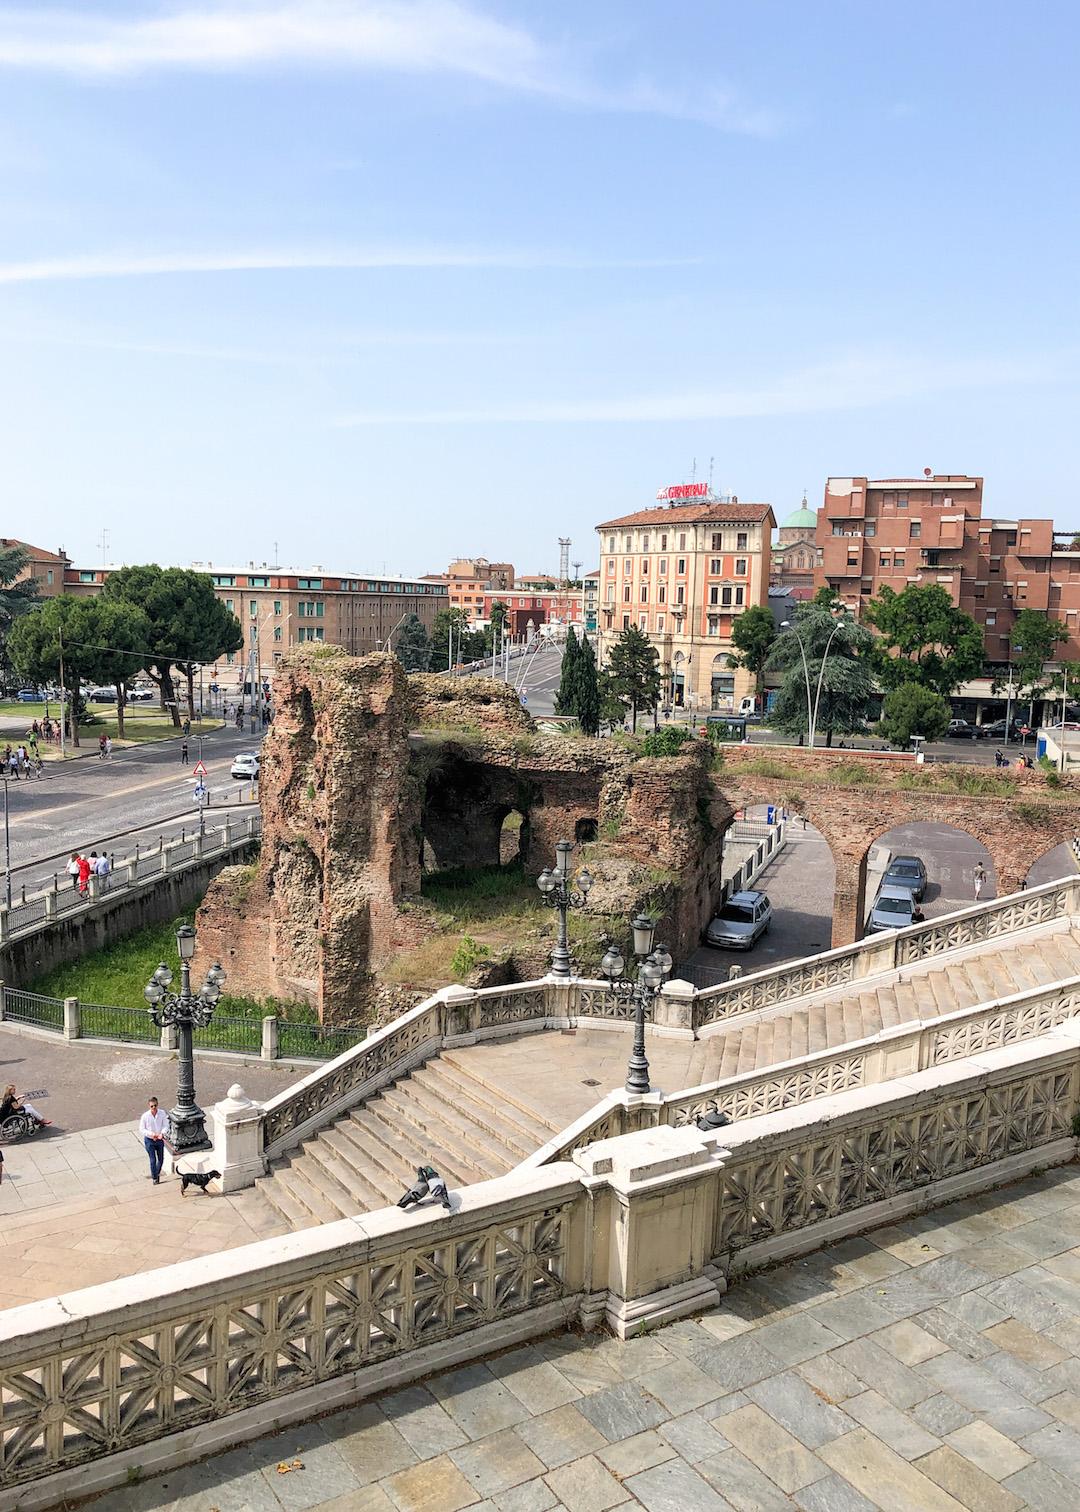 Her_Travel_Edit_Bologna_Parco_della_Montagnola